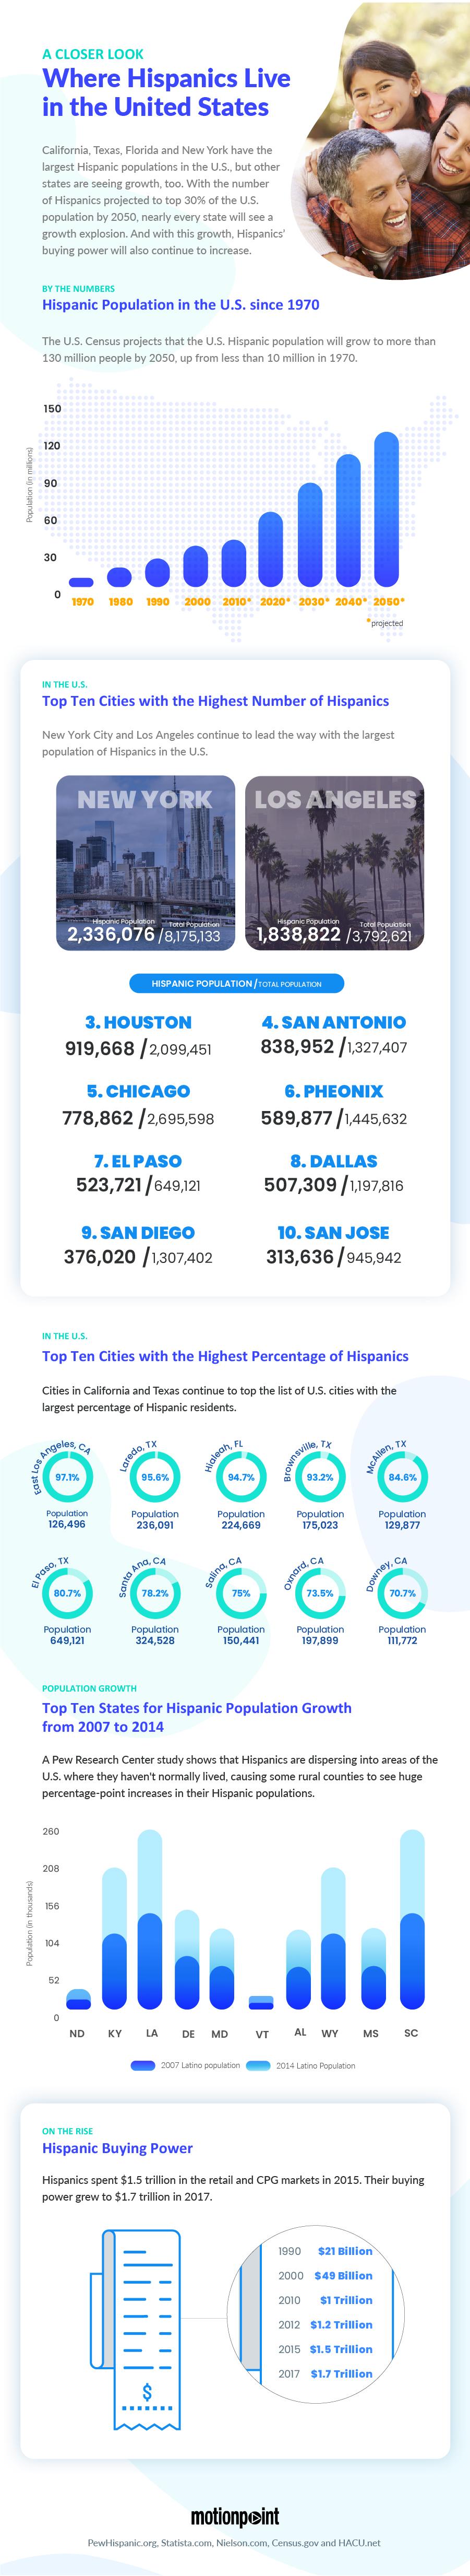 Where Hispanics Live in the United States